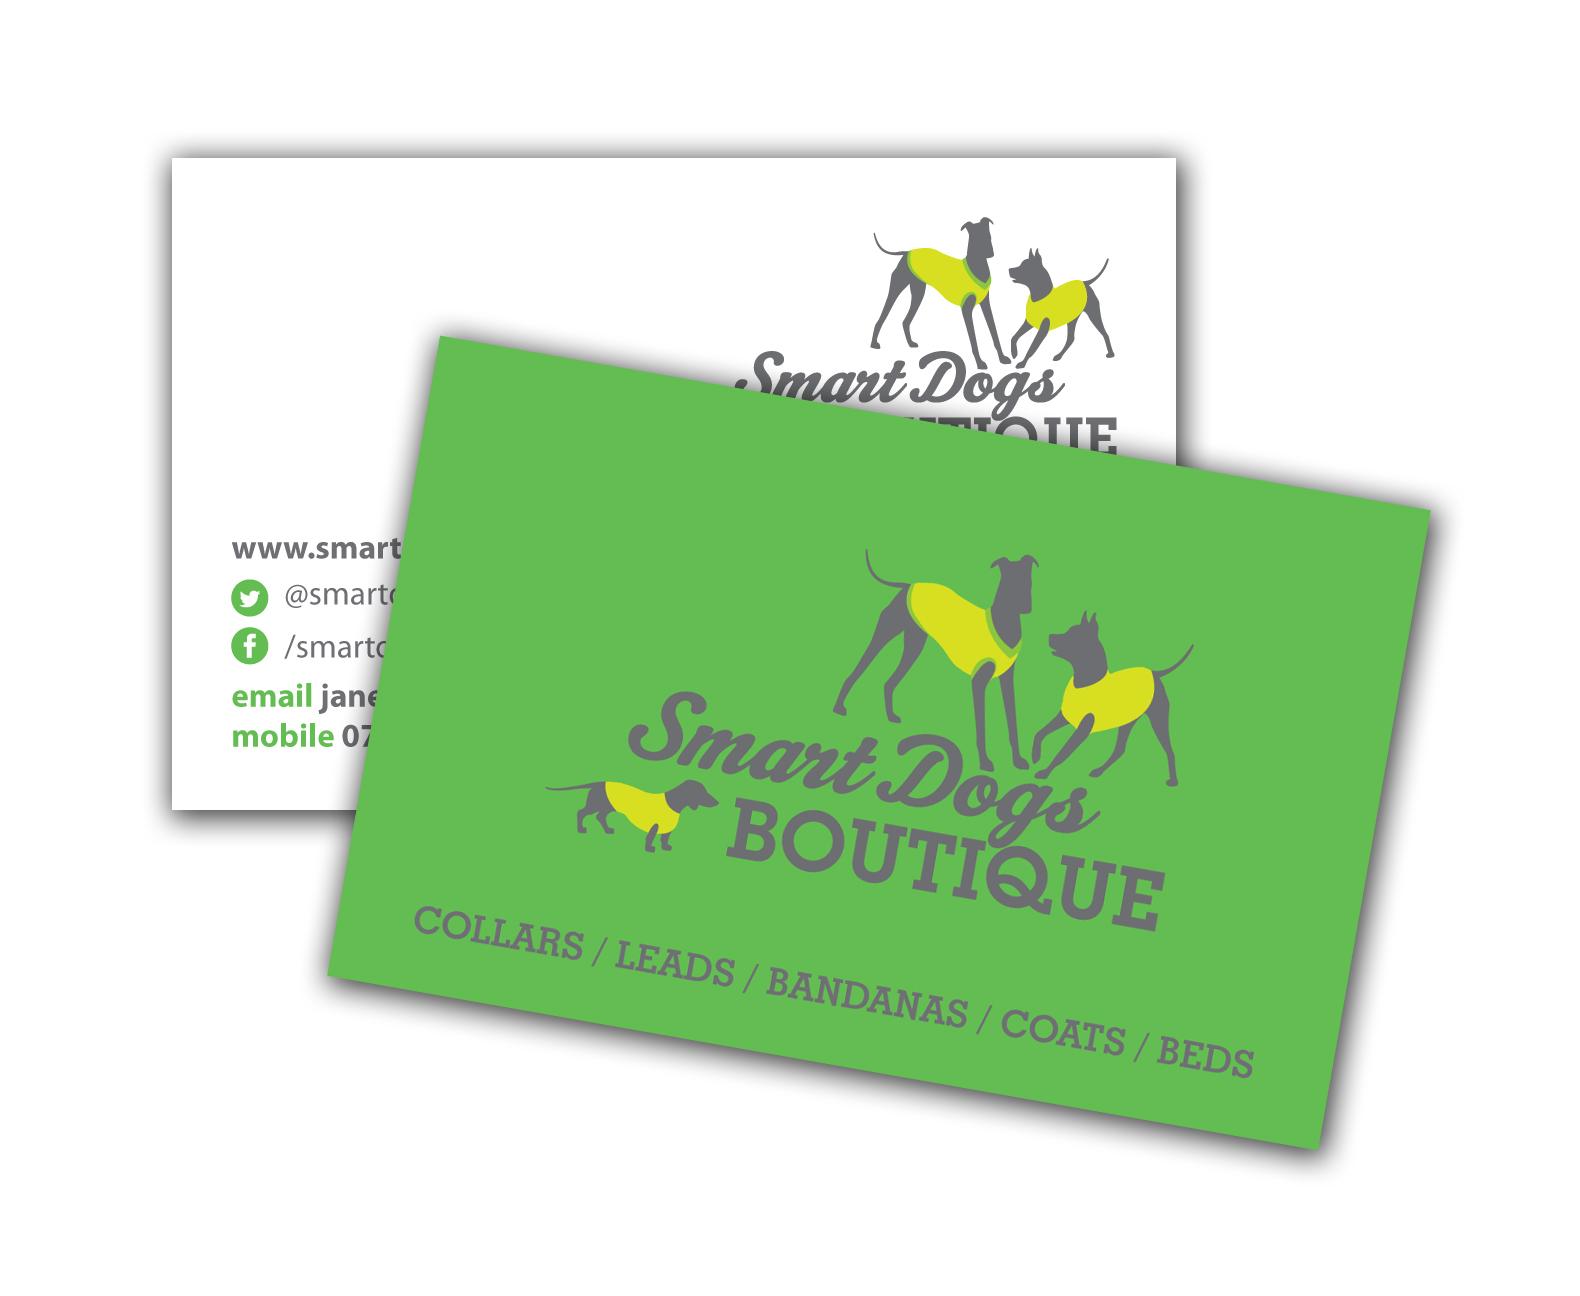 Smart Dogs Boutique Business Cards – Aqua Design Group | Graphics ...